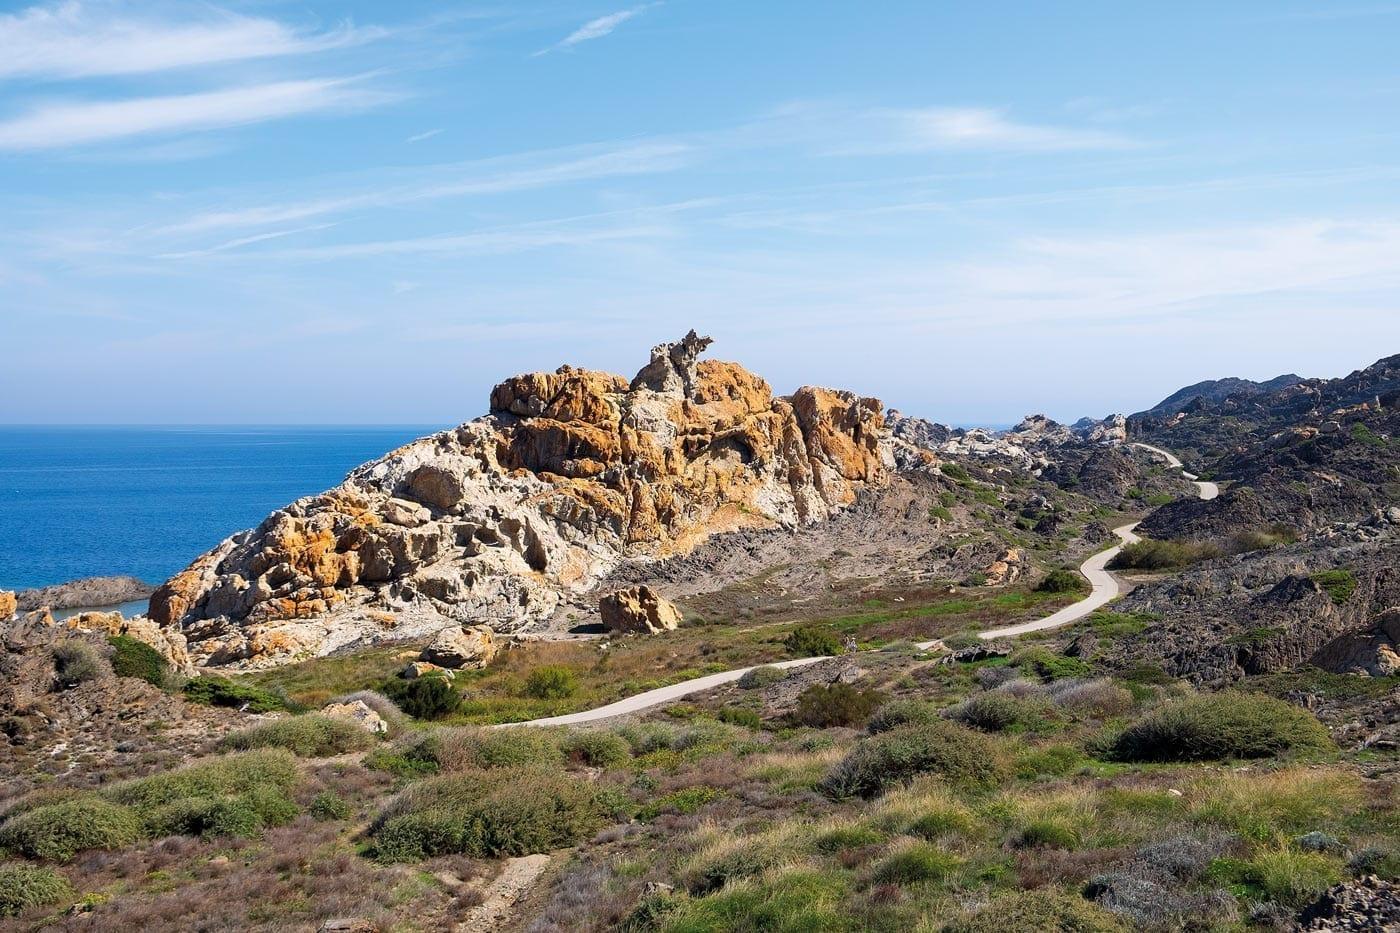 Pla de Tuleda, Salvador Dalí, Cap de Creus, Costa Brava, Mittelmeer, Wandern in Cadaqués